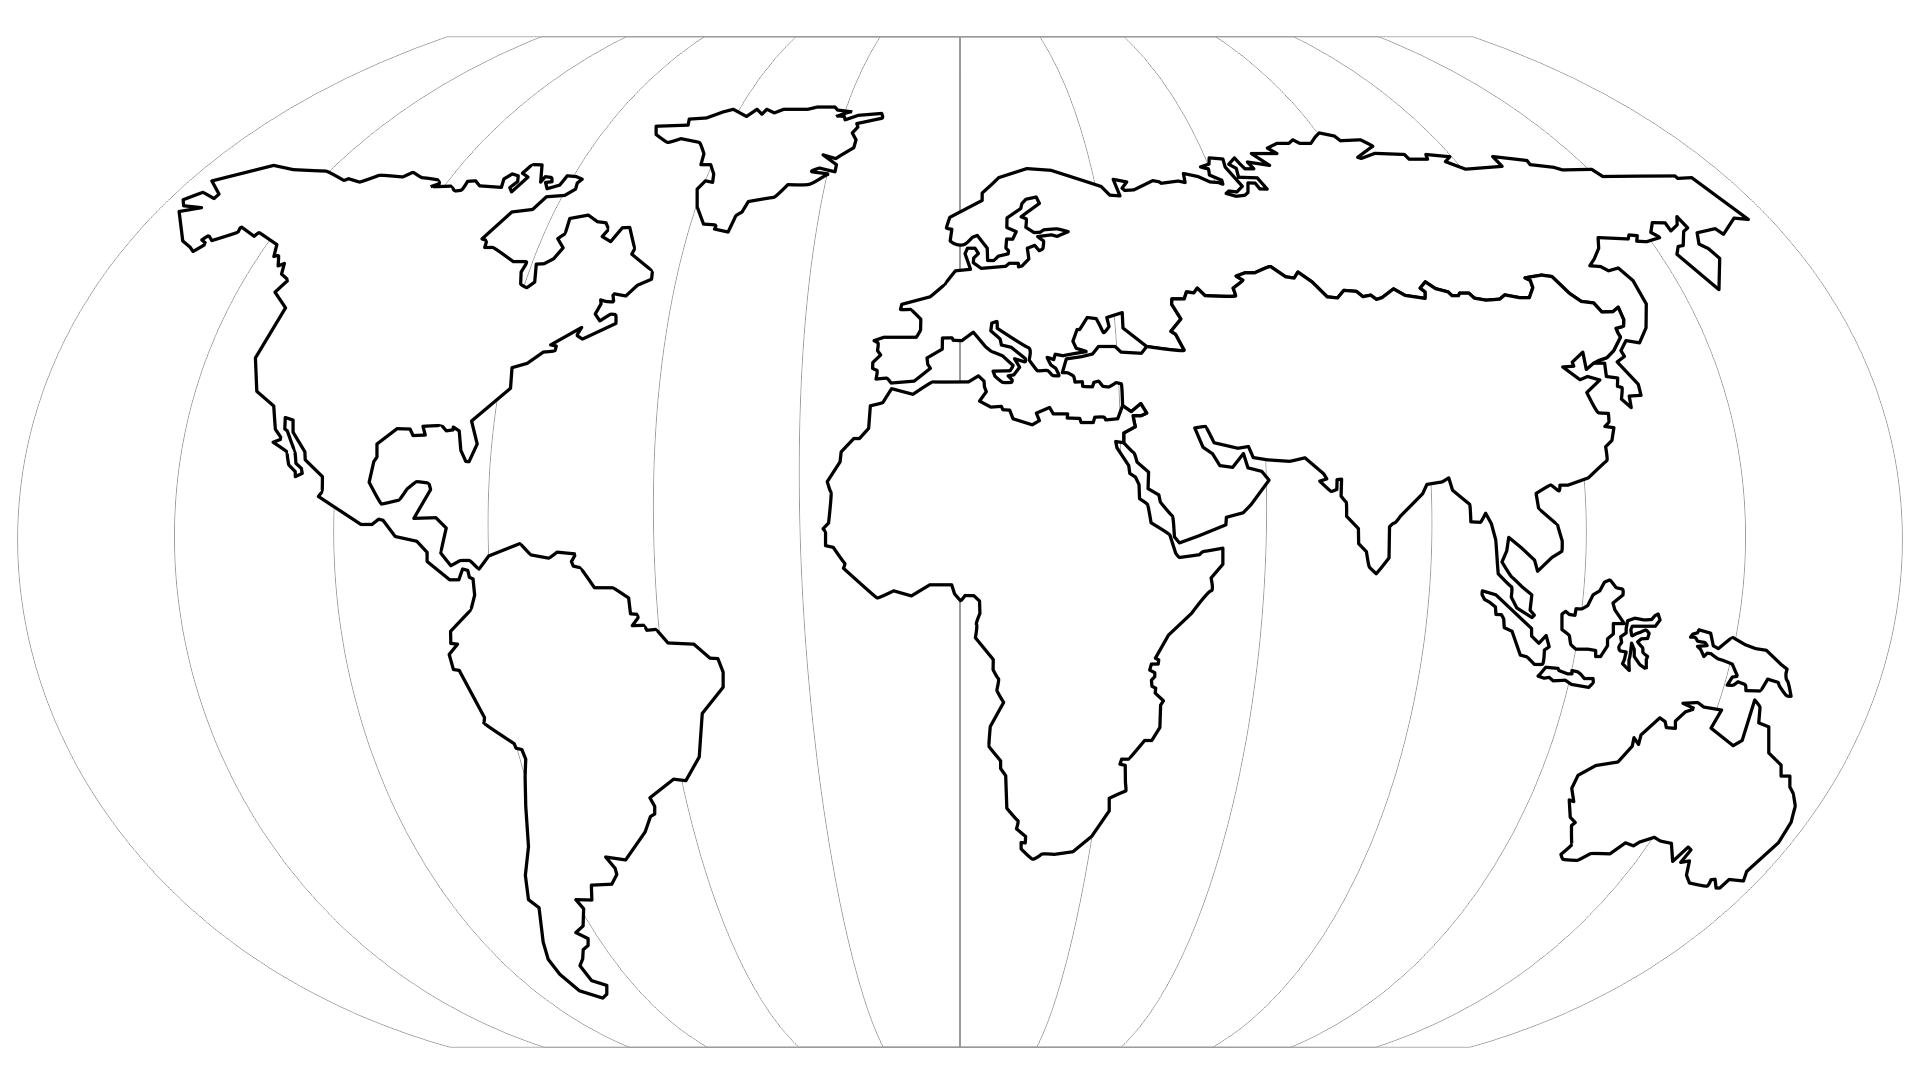 Adaptable image with regard to world map printable pdf